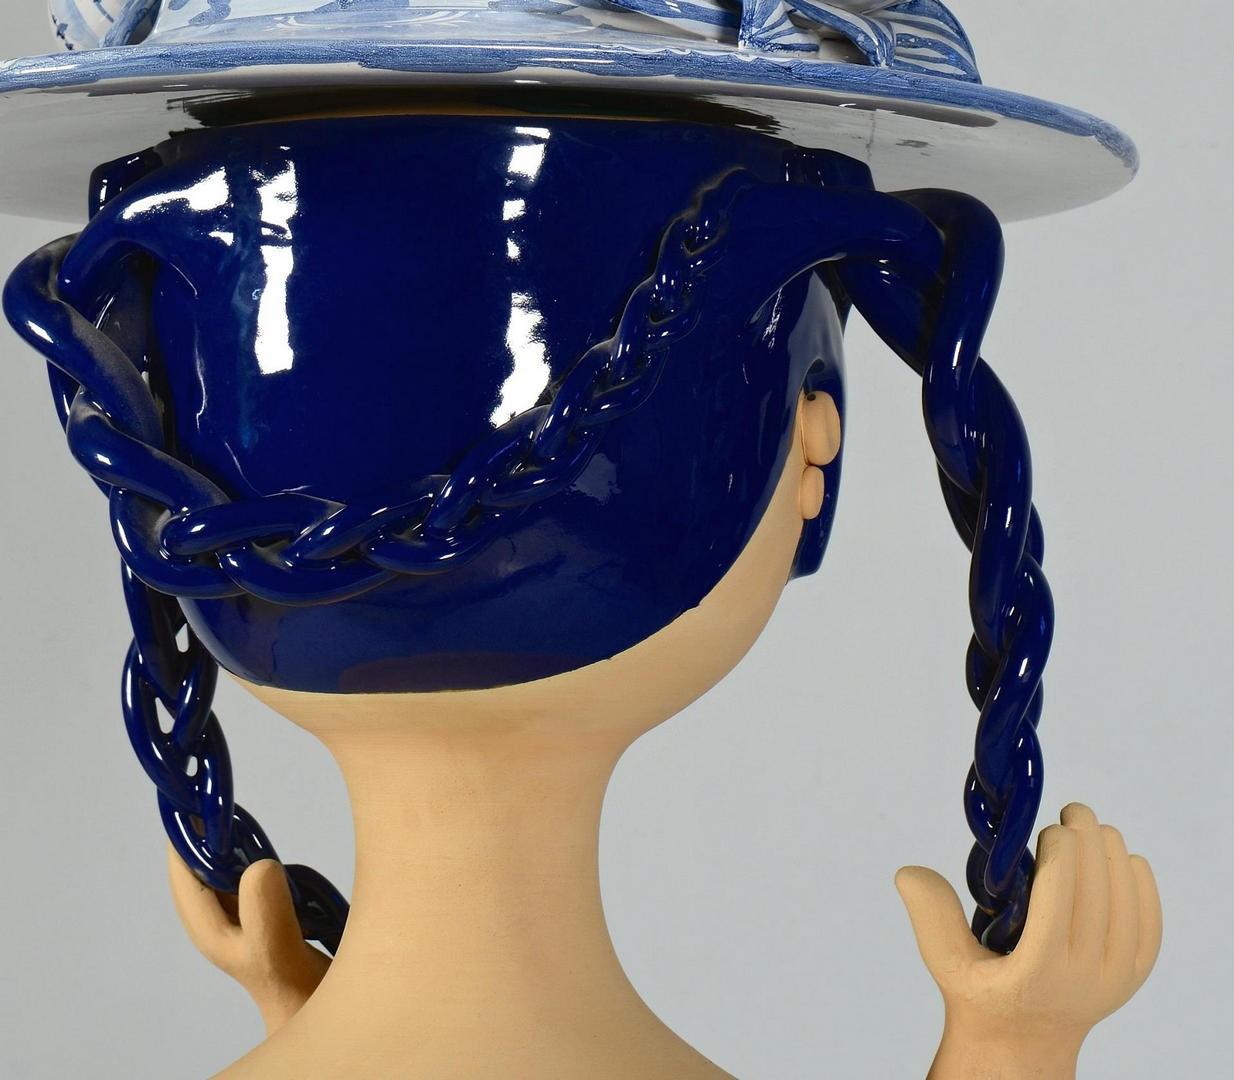 Lot 307: Life Sized Bjorn Wiinblad Sculpture